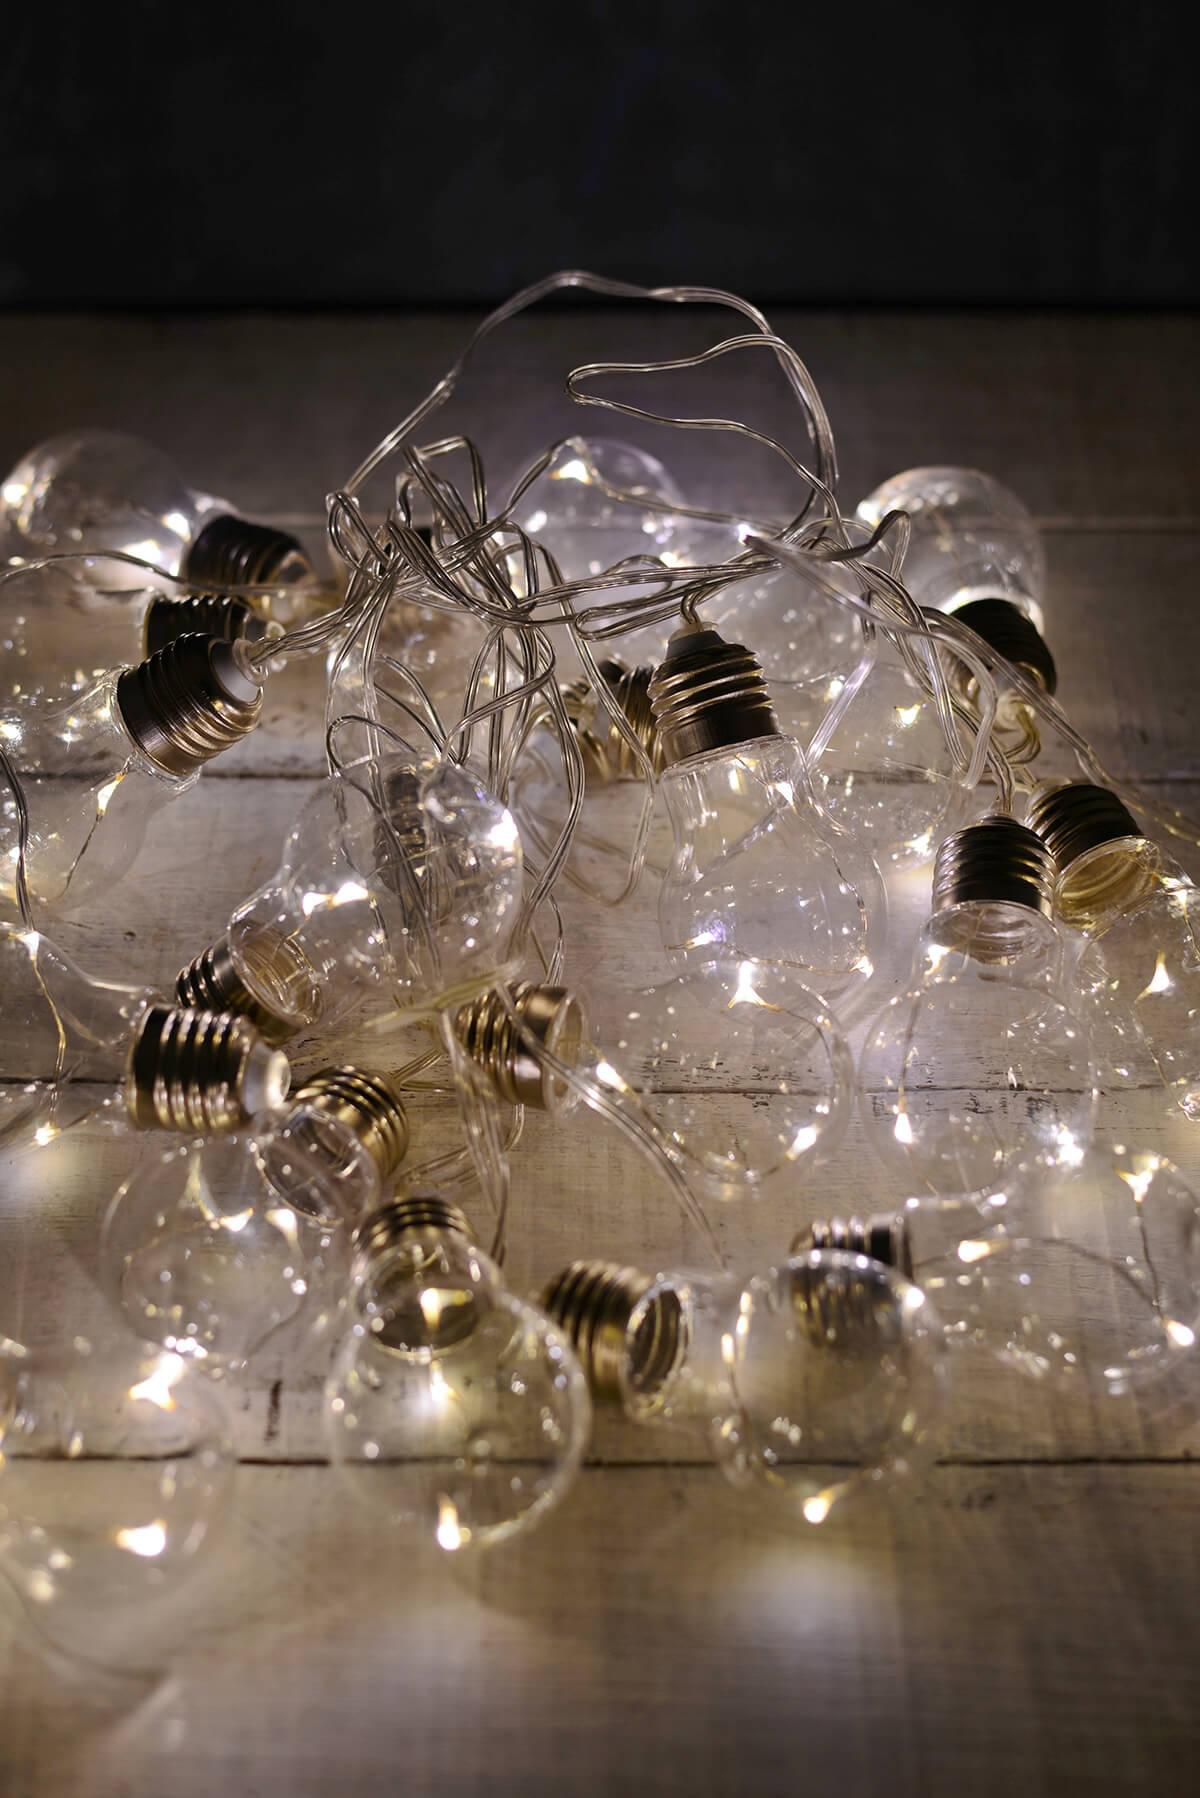 edison bulb led string lights 20ct 9ft clear cord. Black Bedroom Furniture Sets. Home Design Ideas